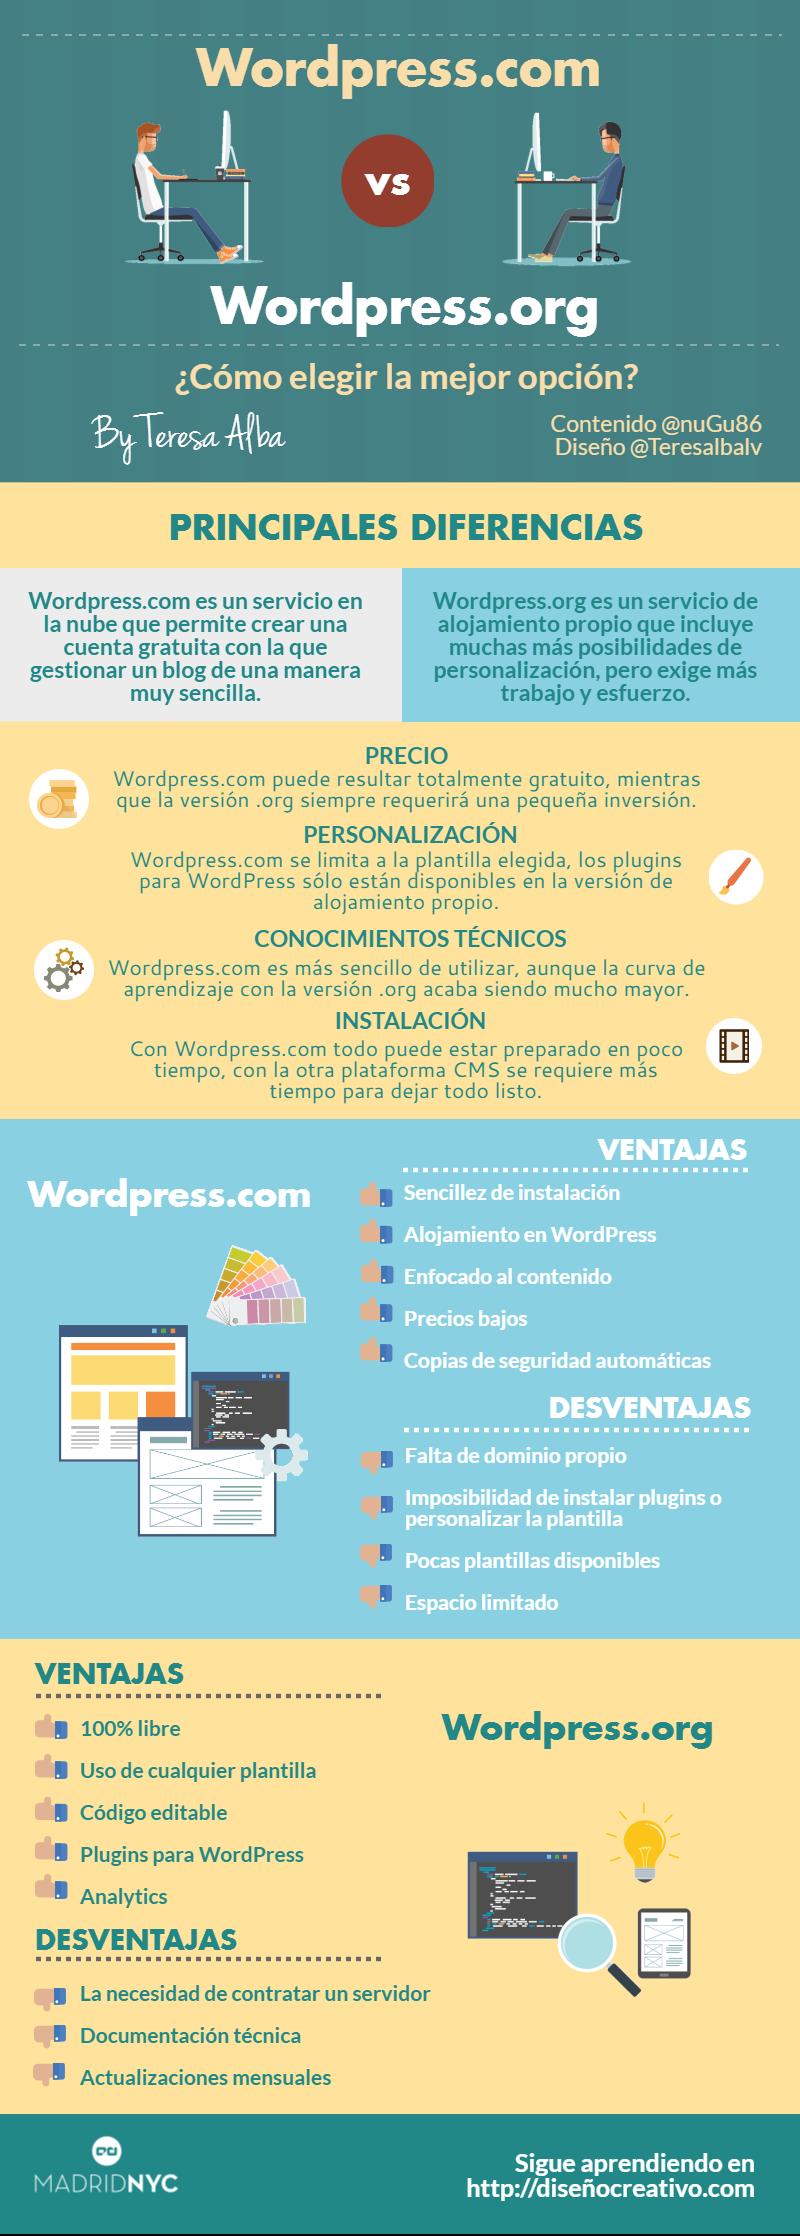 Infografía WordPress.com vs WordPress.org